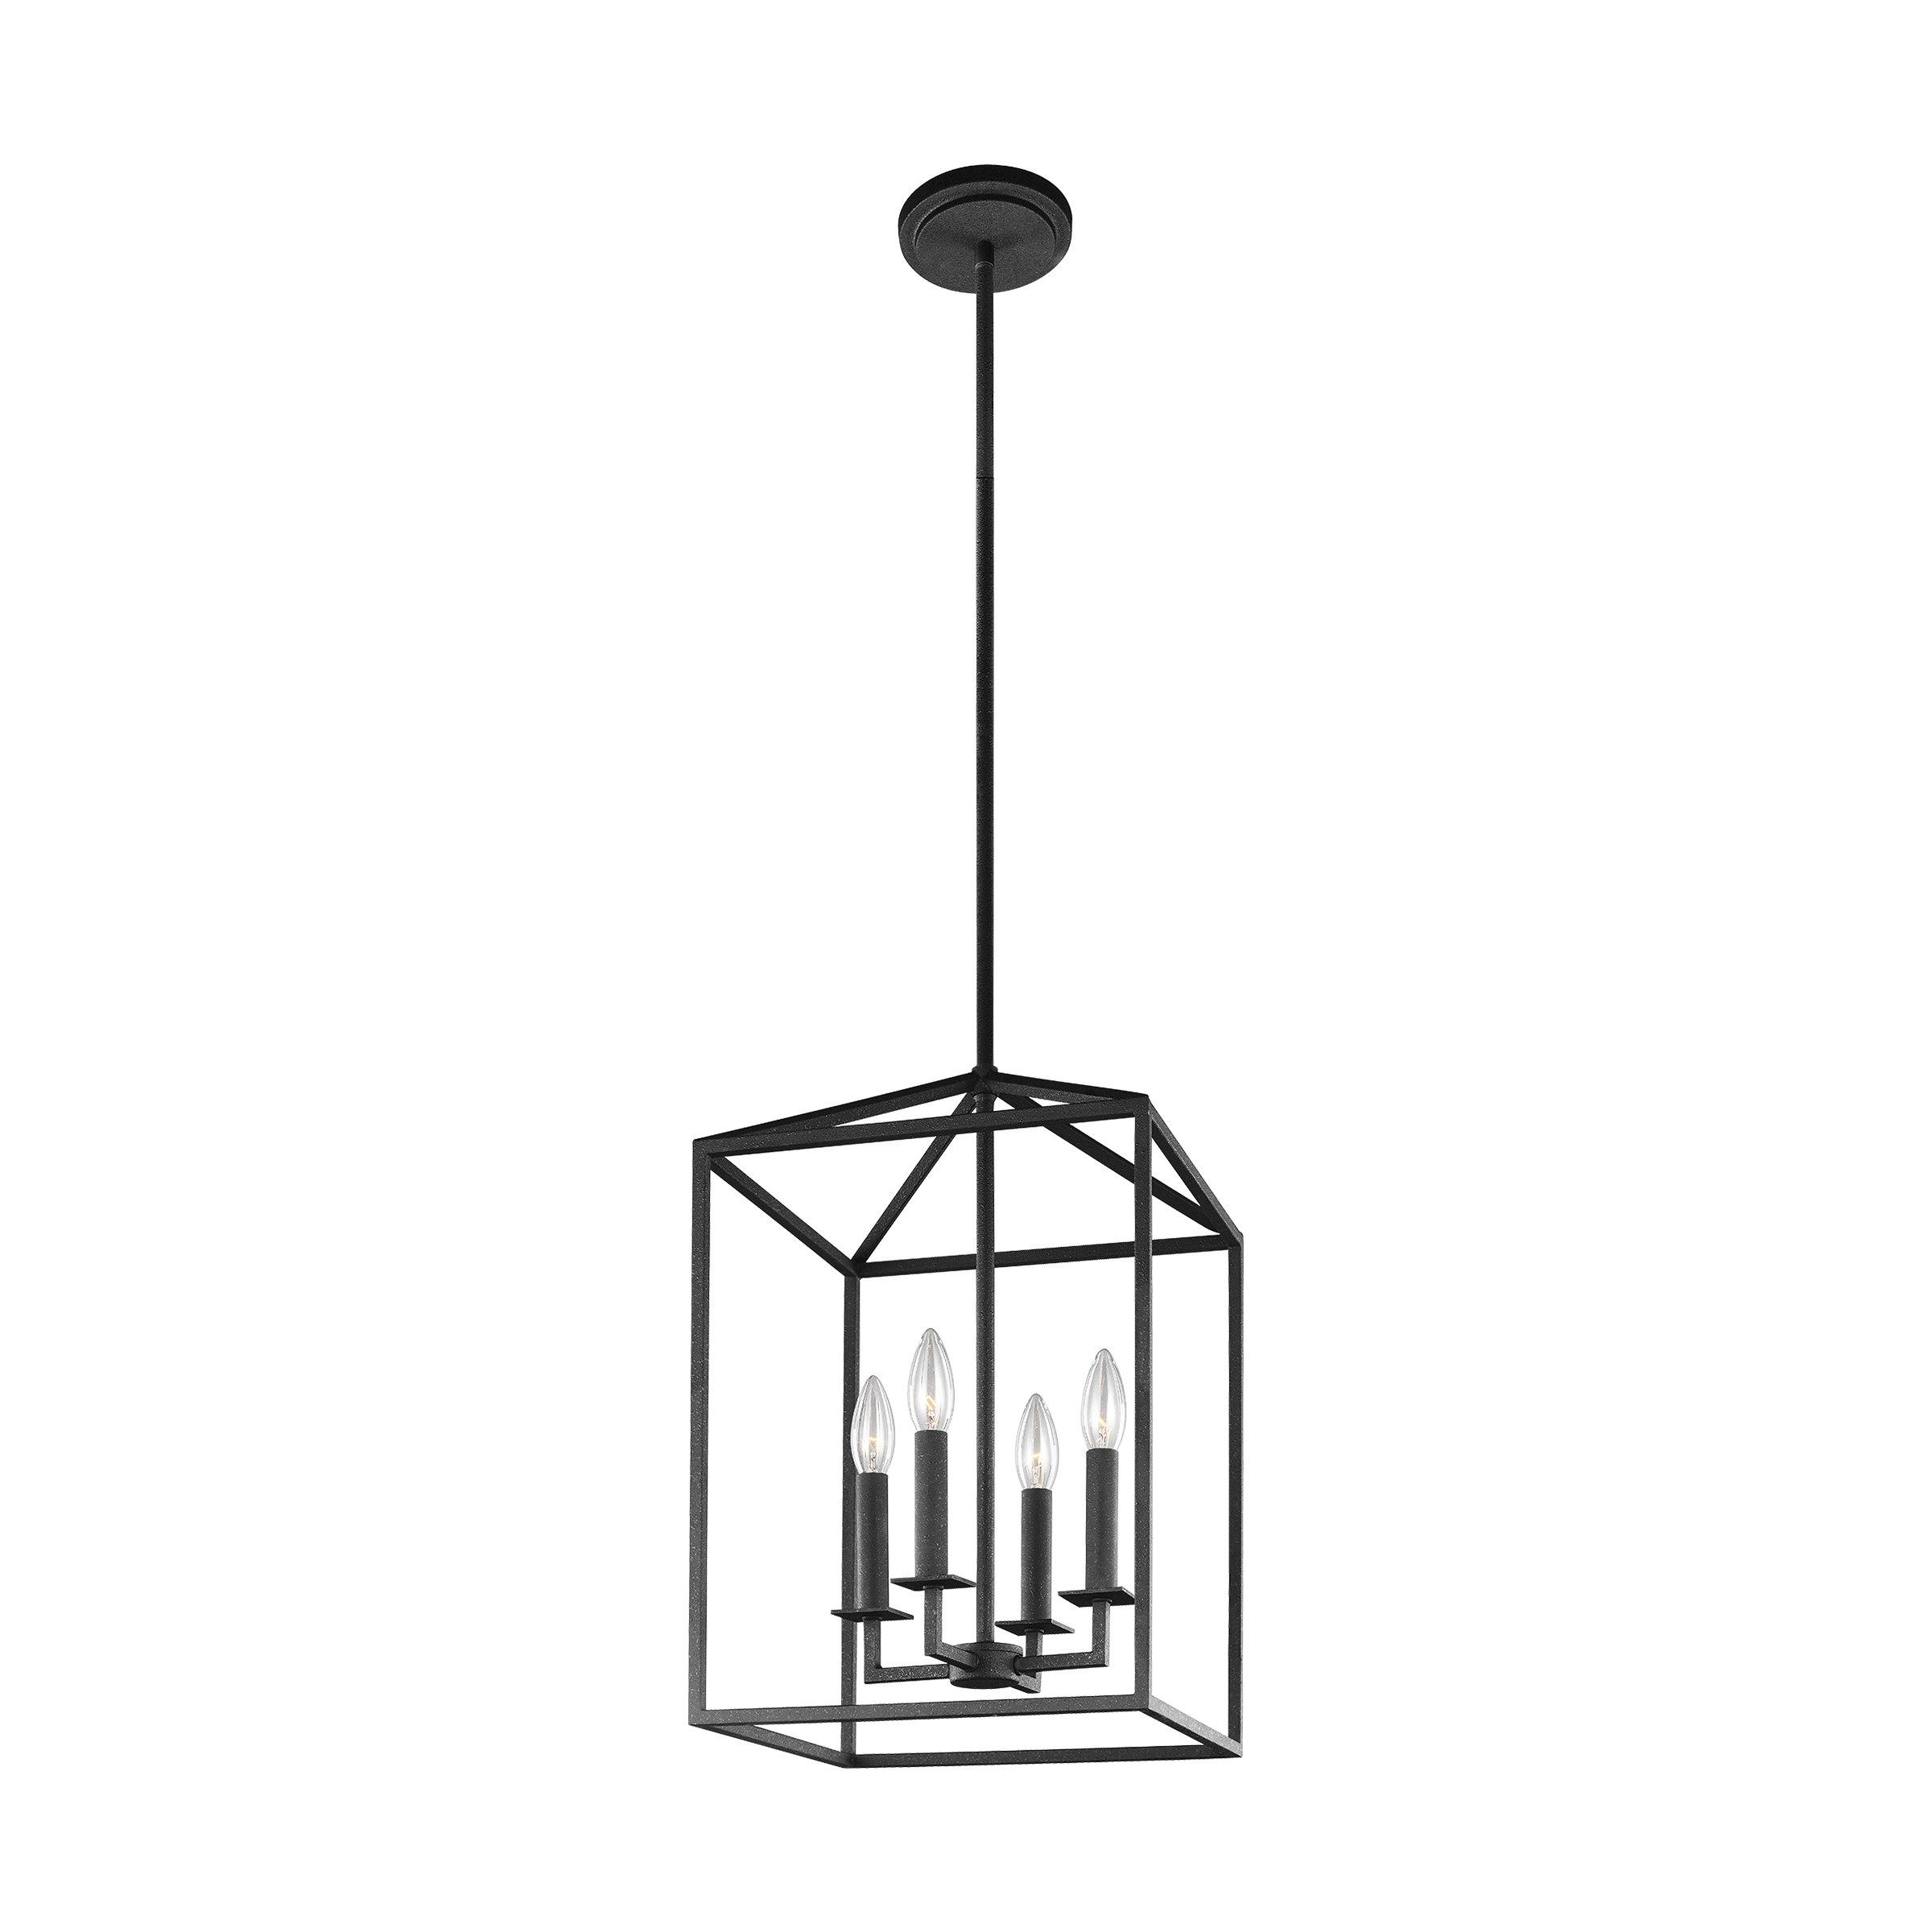 Odie 4 Light Lantern Square / Rectangle Pendant Throughout Well Known 4 Light Lantern Square / Rectangle Pendants (View 16 of 20)